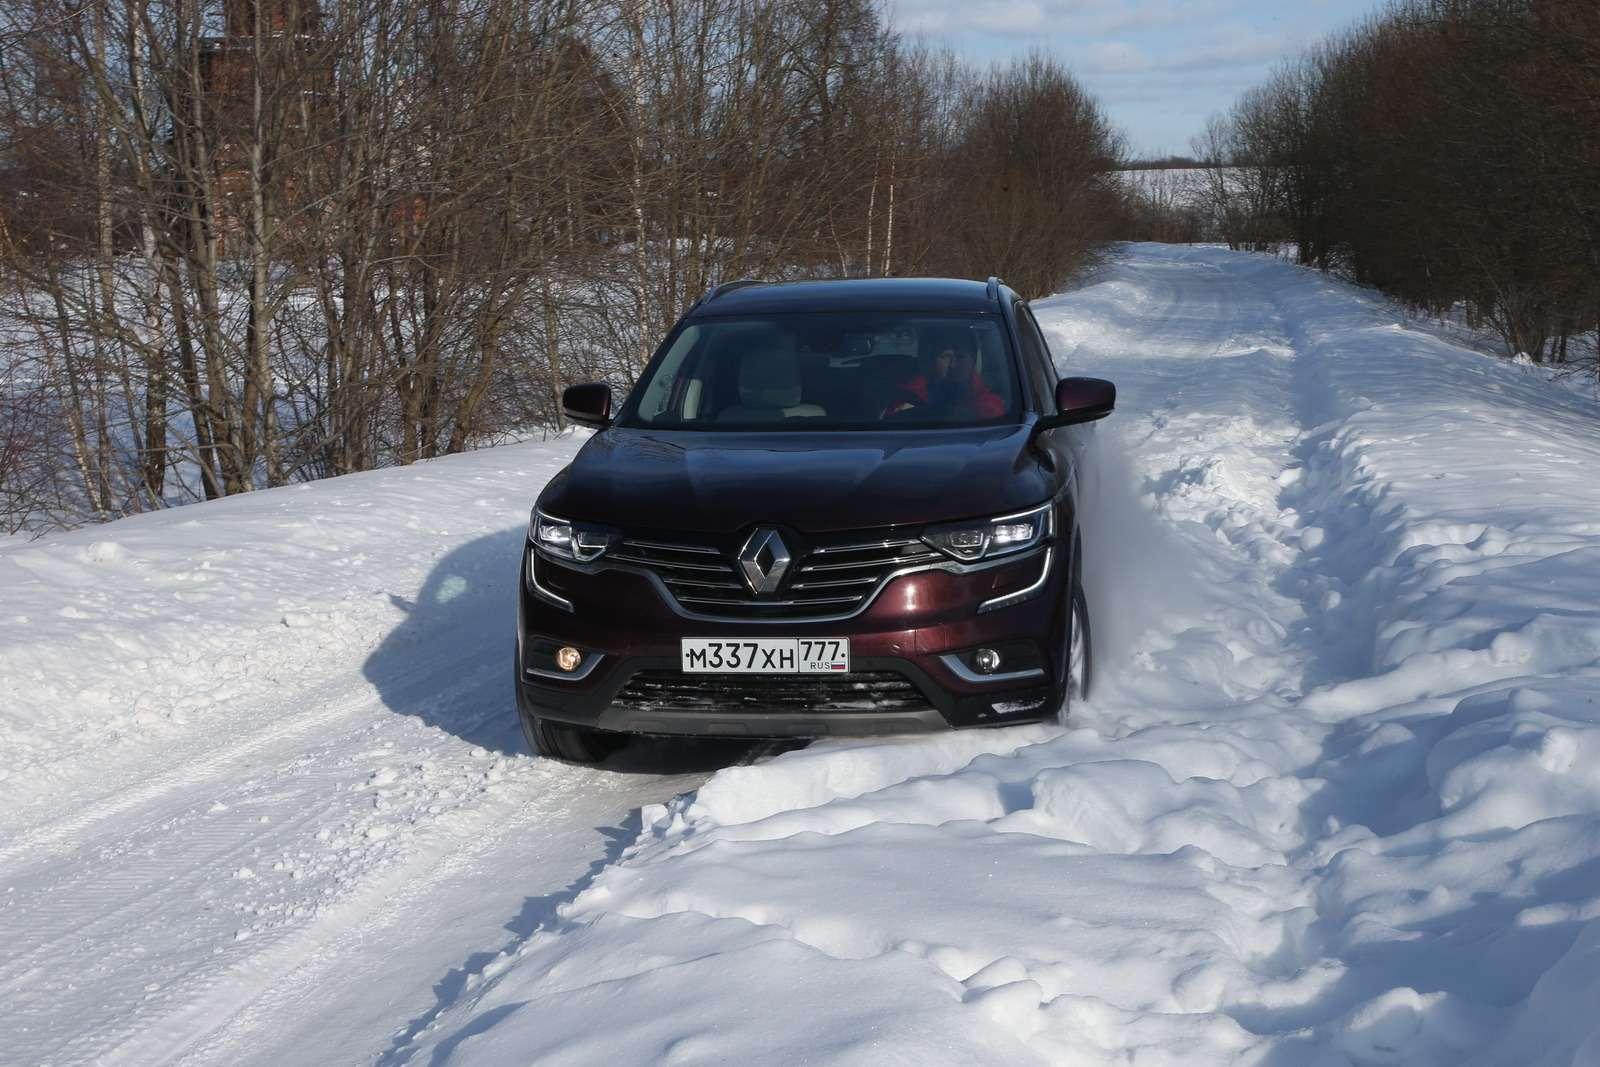 Renault Koleos 4х4 против Peugeot 50084х2: полный привод или электроника?— фото 860343